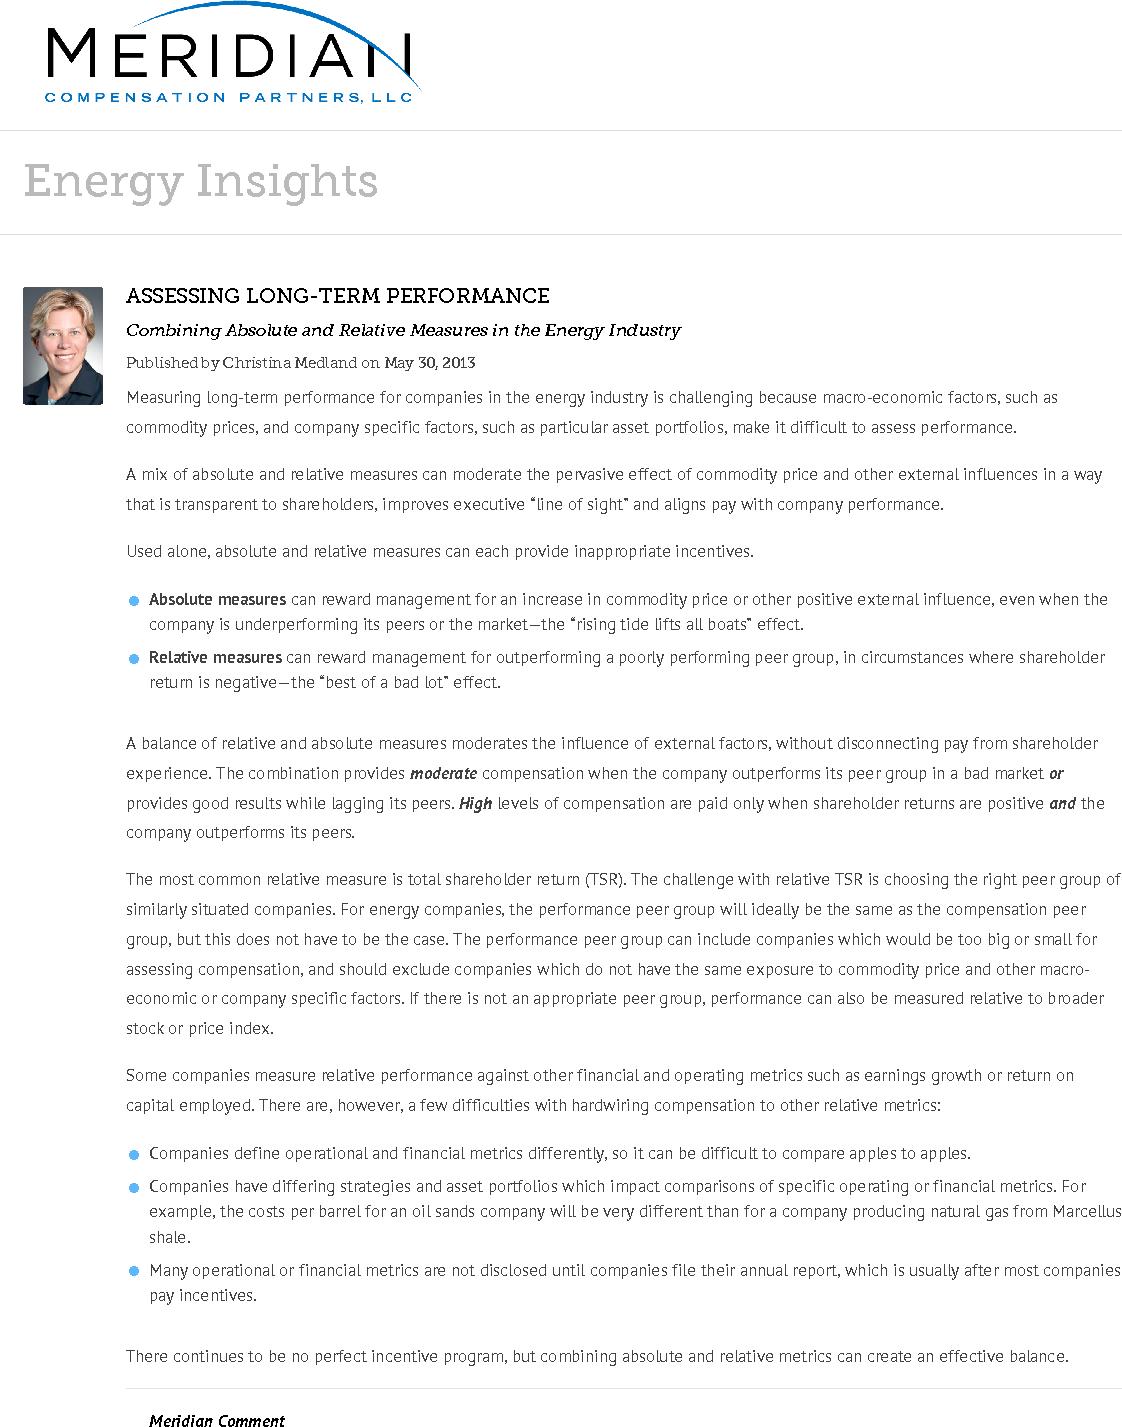 Assessing Long-Term Performance (PDF)